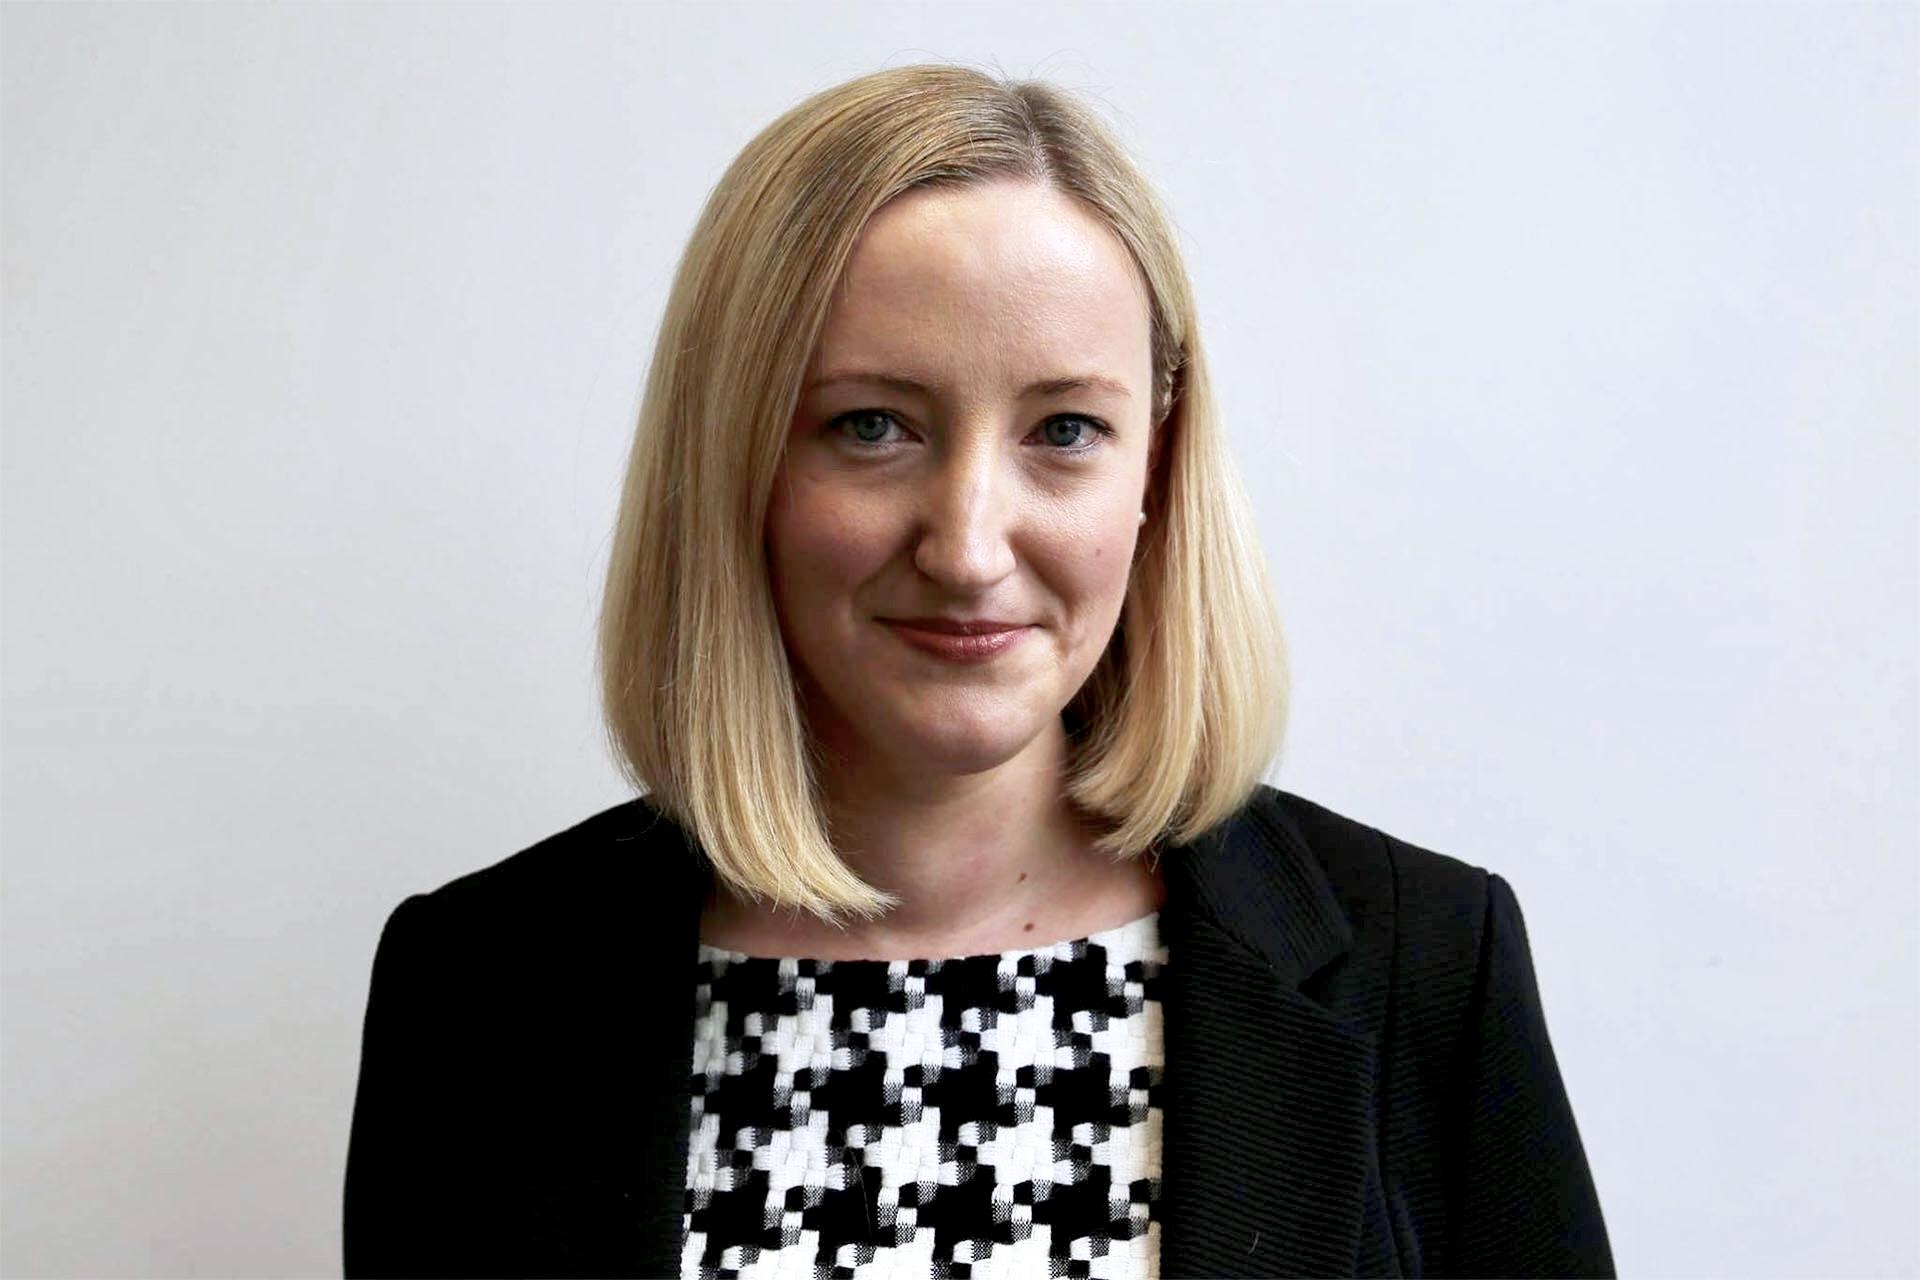 Samantha Bedford